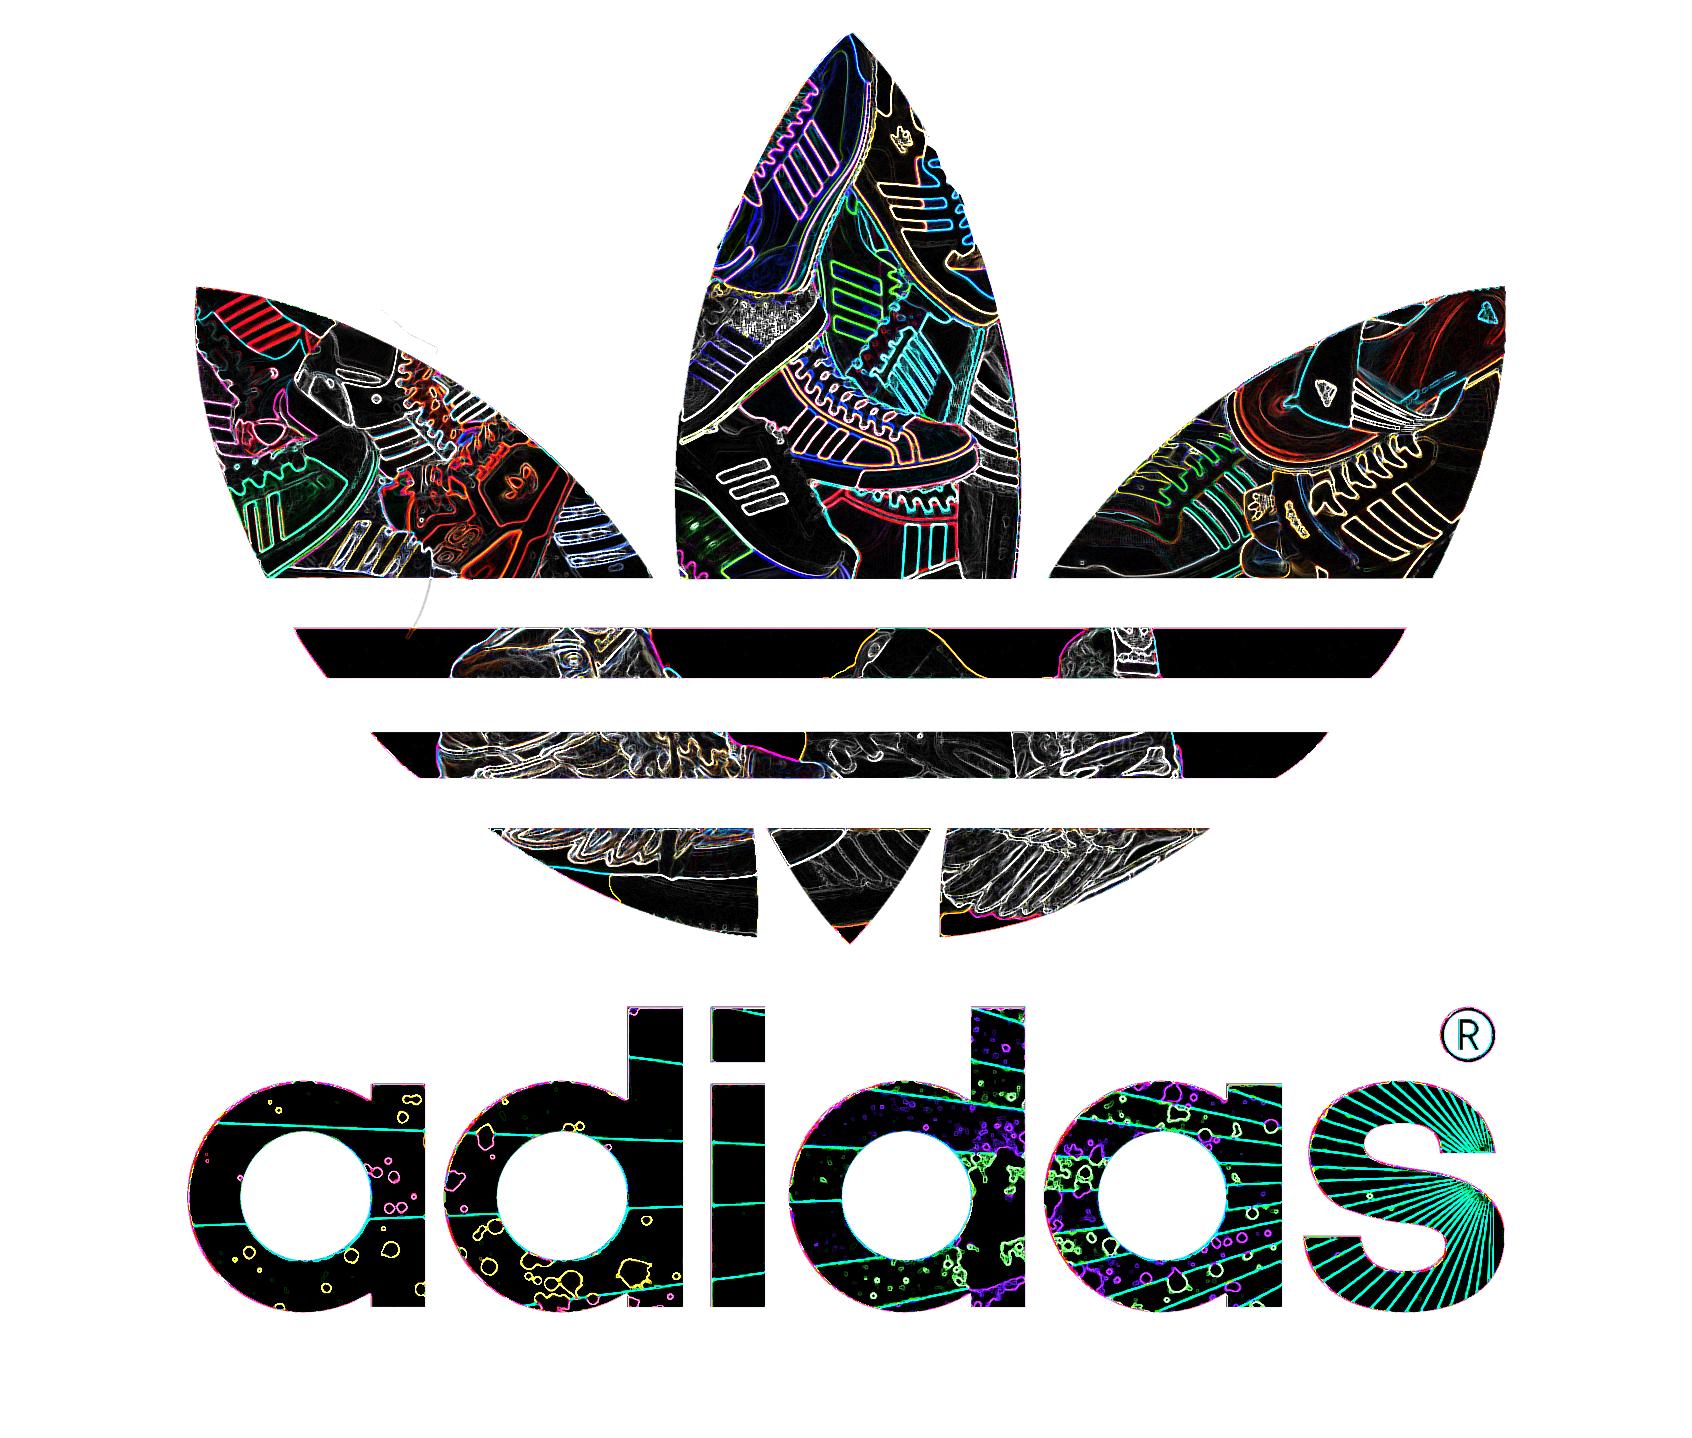 Adidas Logo 2016 - Adidas, Transparent background PNG HD thumbnail